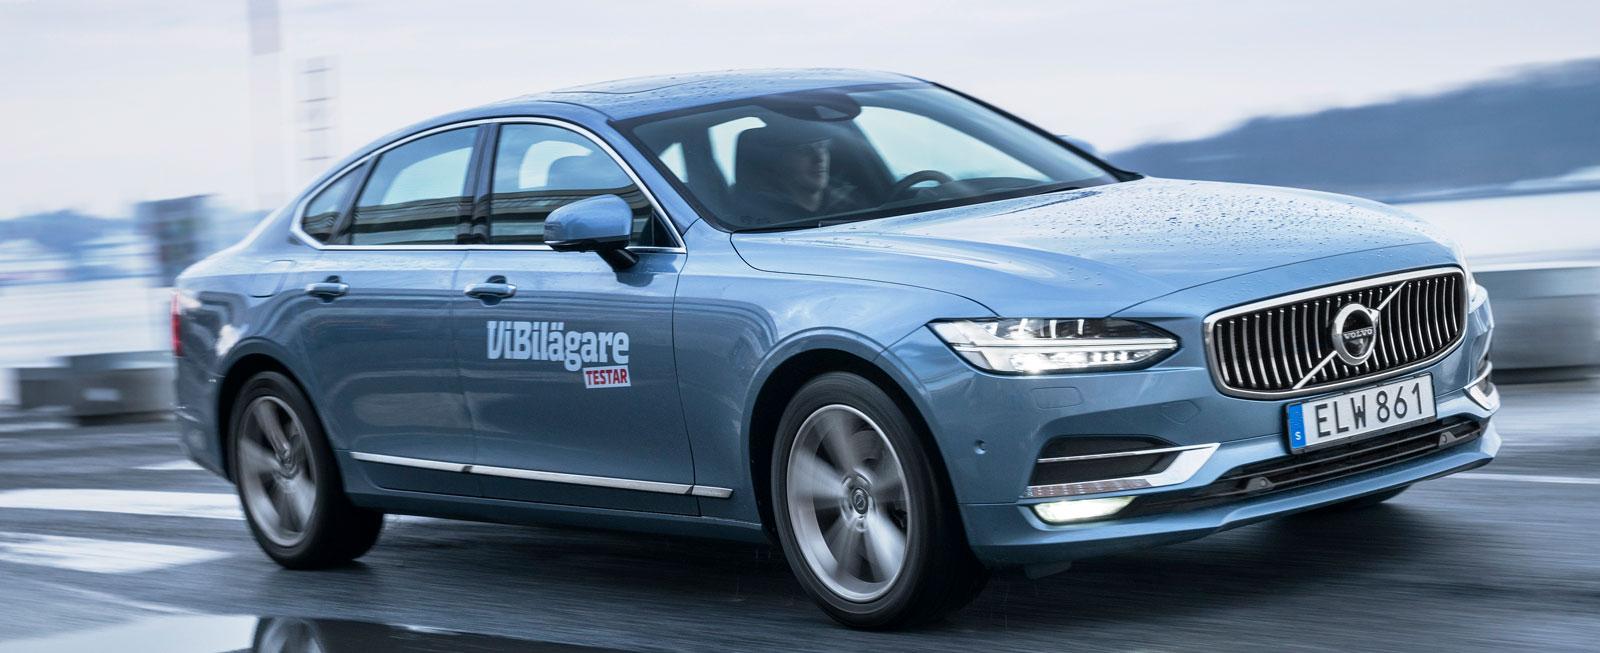 Test: BMW 5-serie, Mercedes E-klass och Volvo S90 (2017)